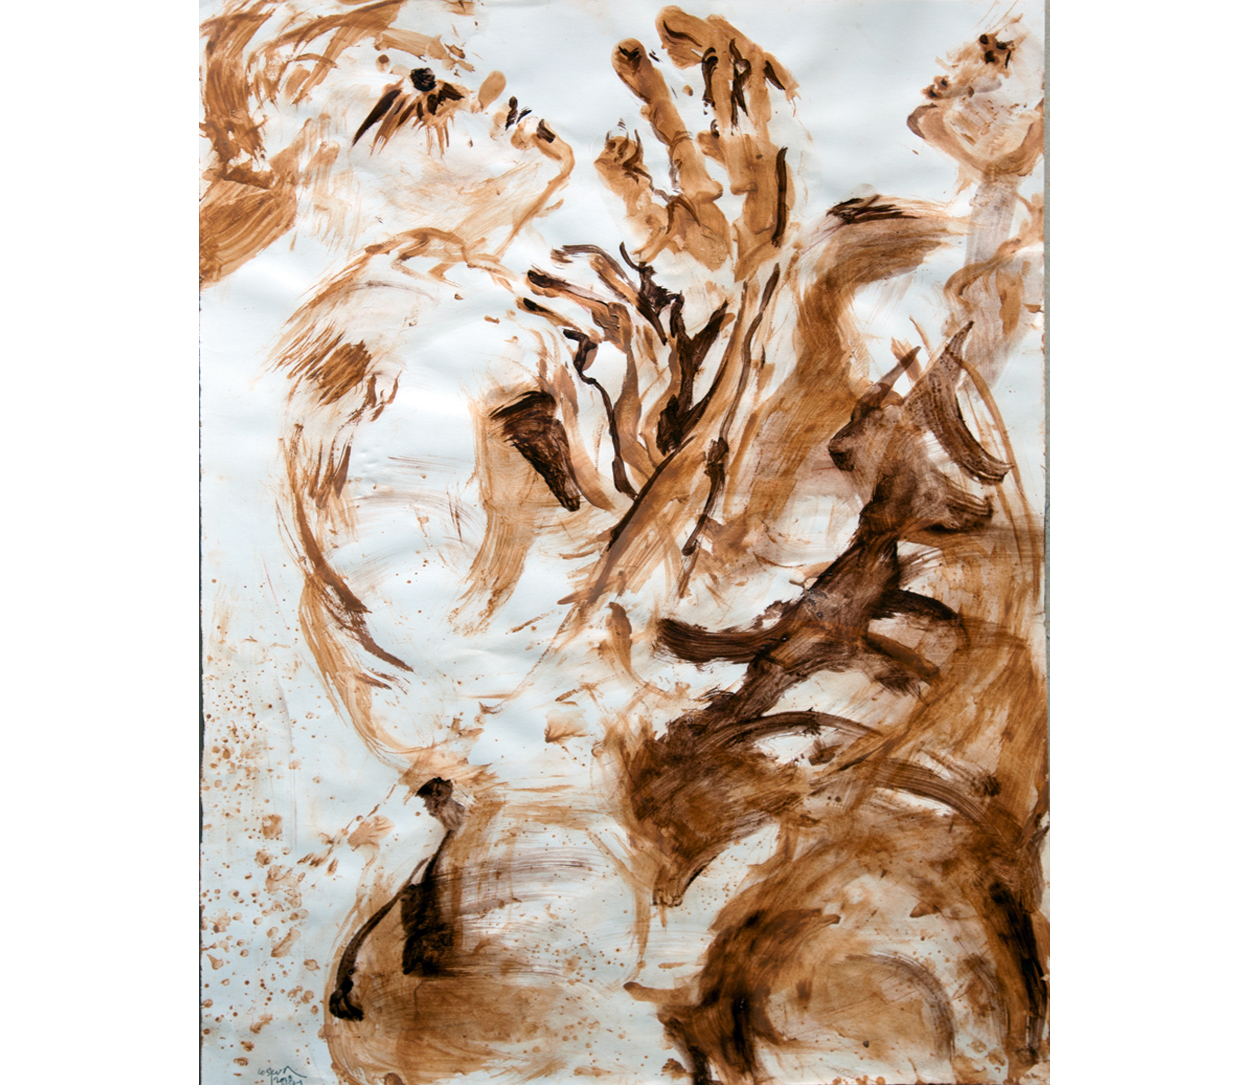 Terra on paper 3, 50x70 cm